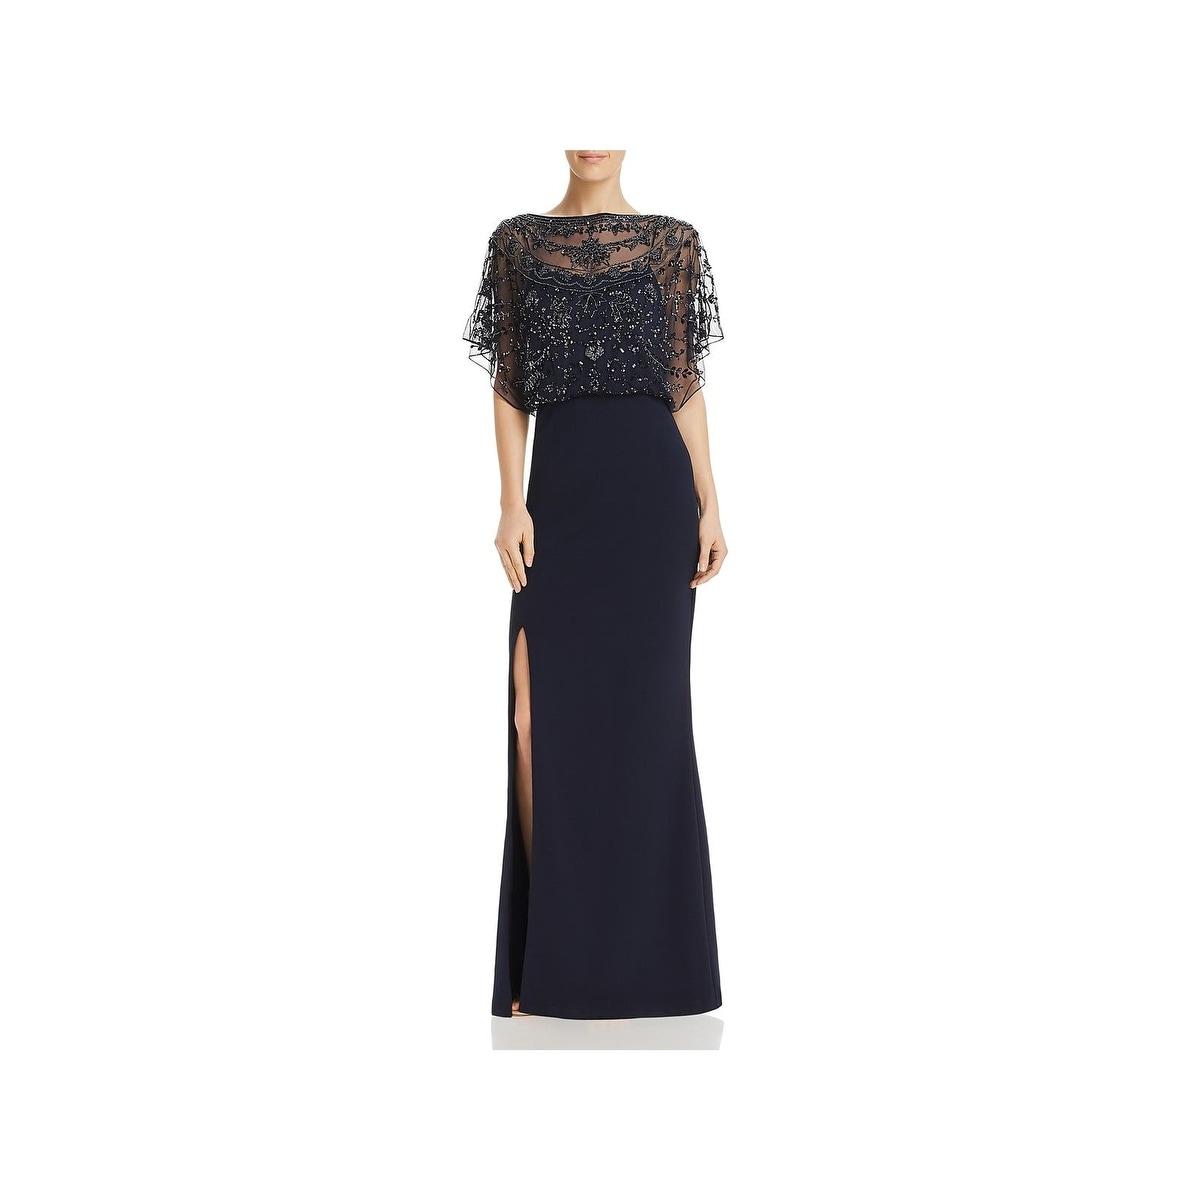 ef121cd89be Aidan Mattox Dresses